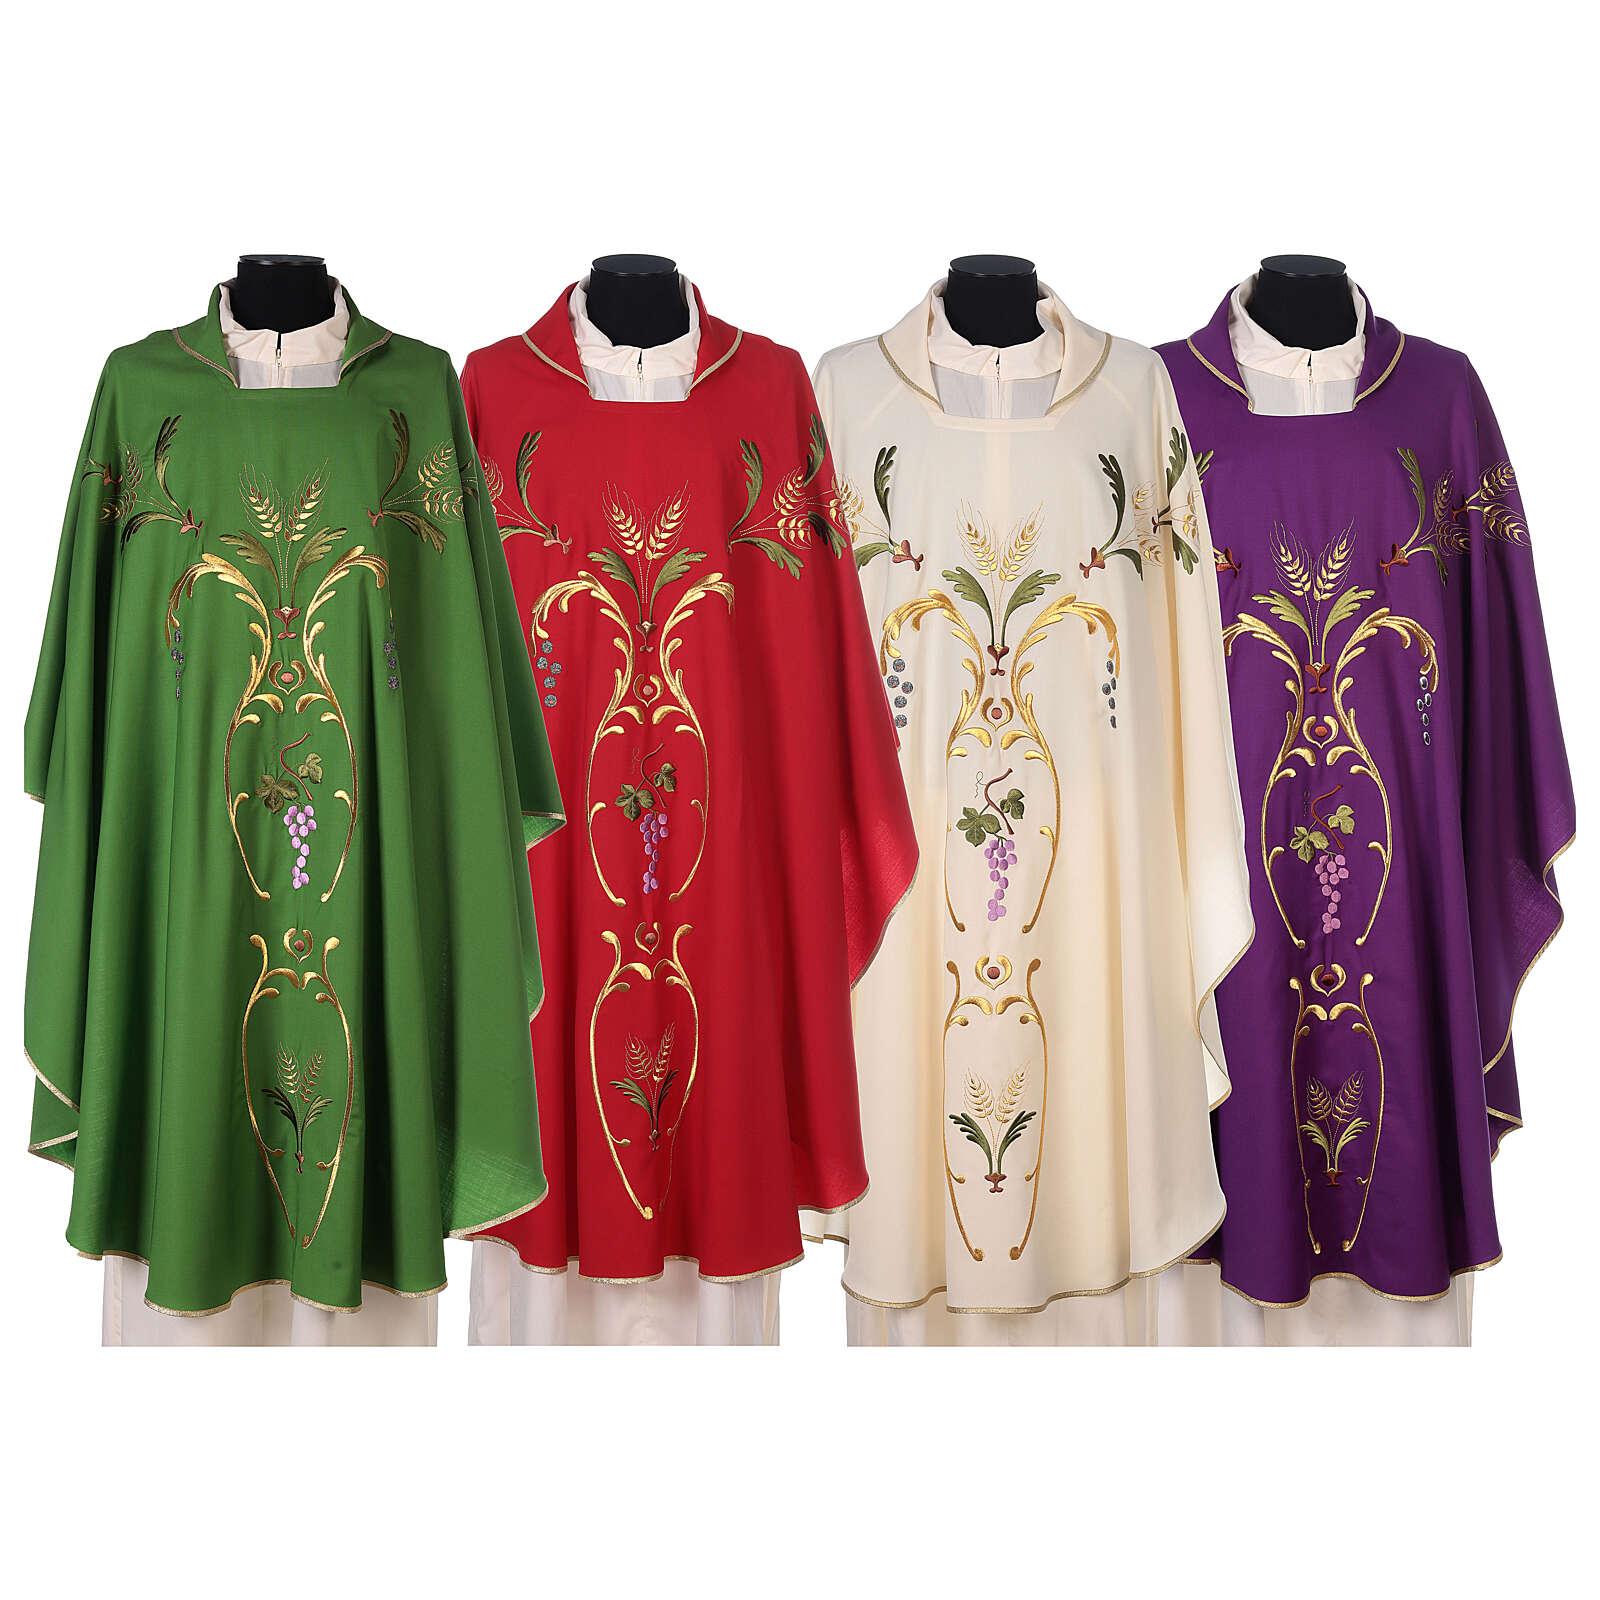 Casula sacerdotale spighe uva foglie pura lana 4